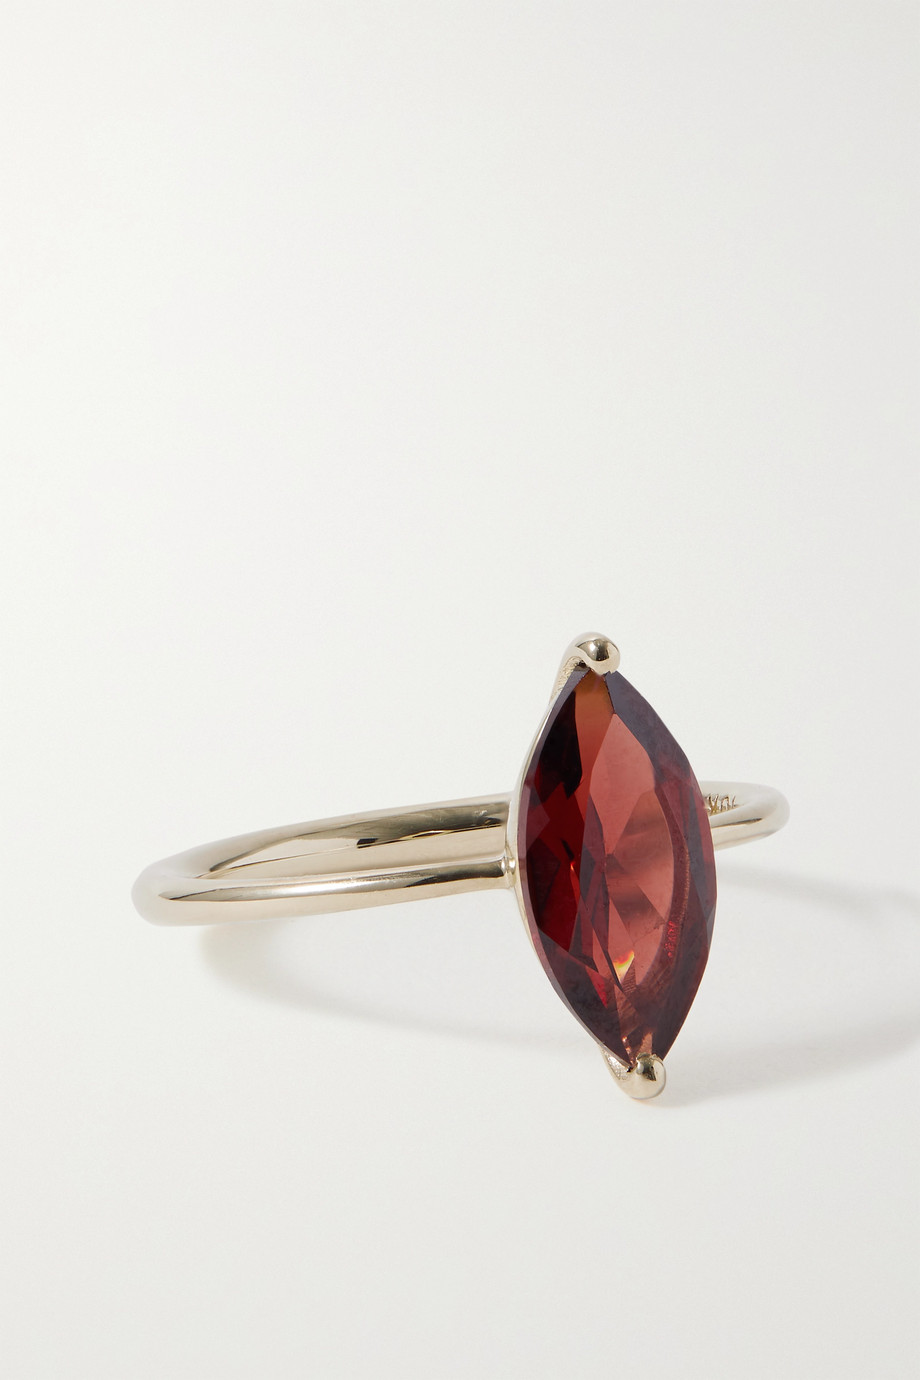 SARAH & SEBASTIAN Winedark 10-karat recycled gold garnet ring